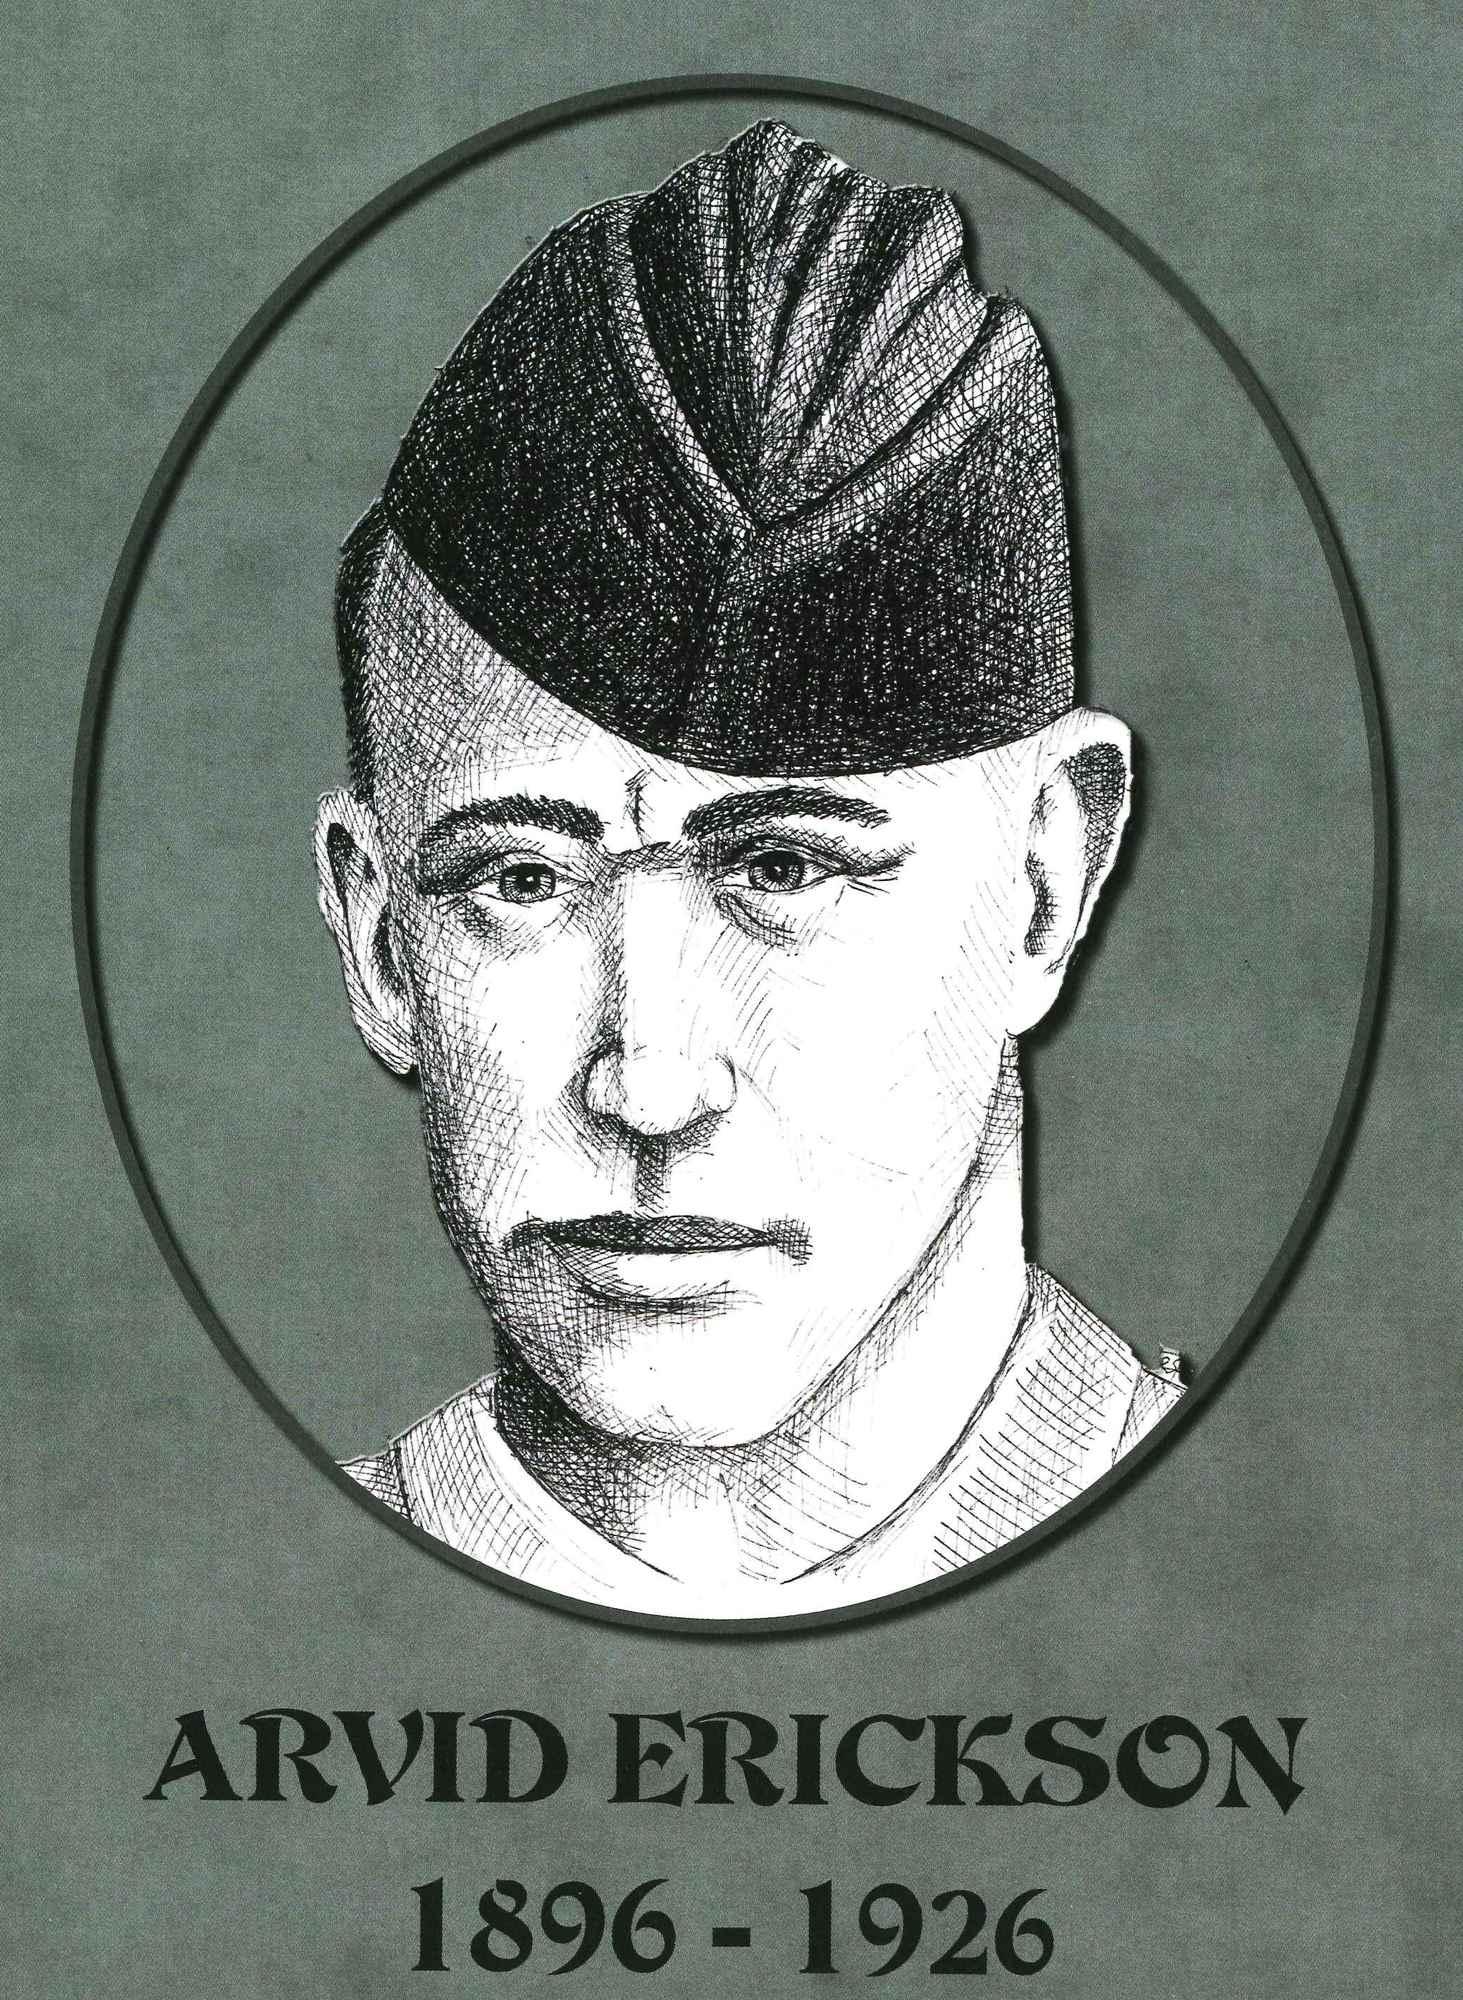 Sketch of Arvid Erickson, killed in September 1926.